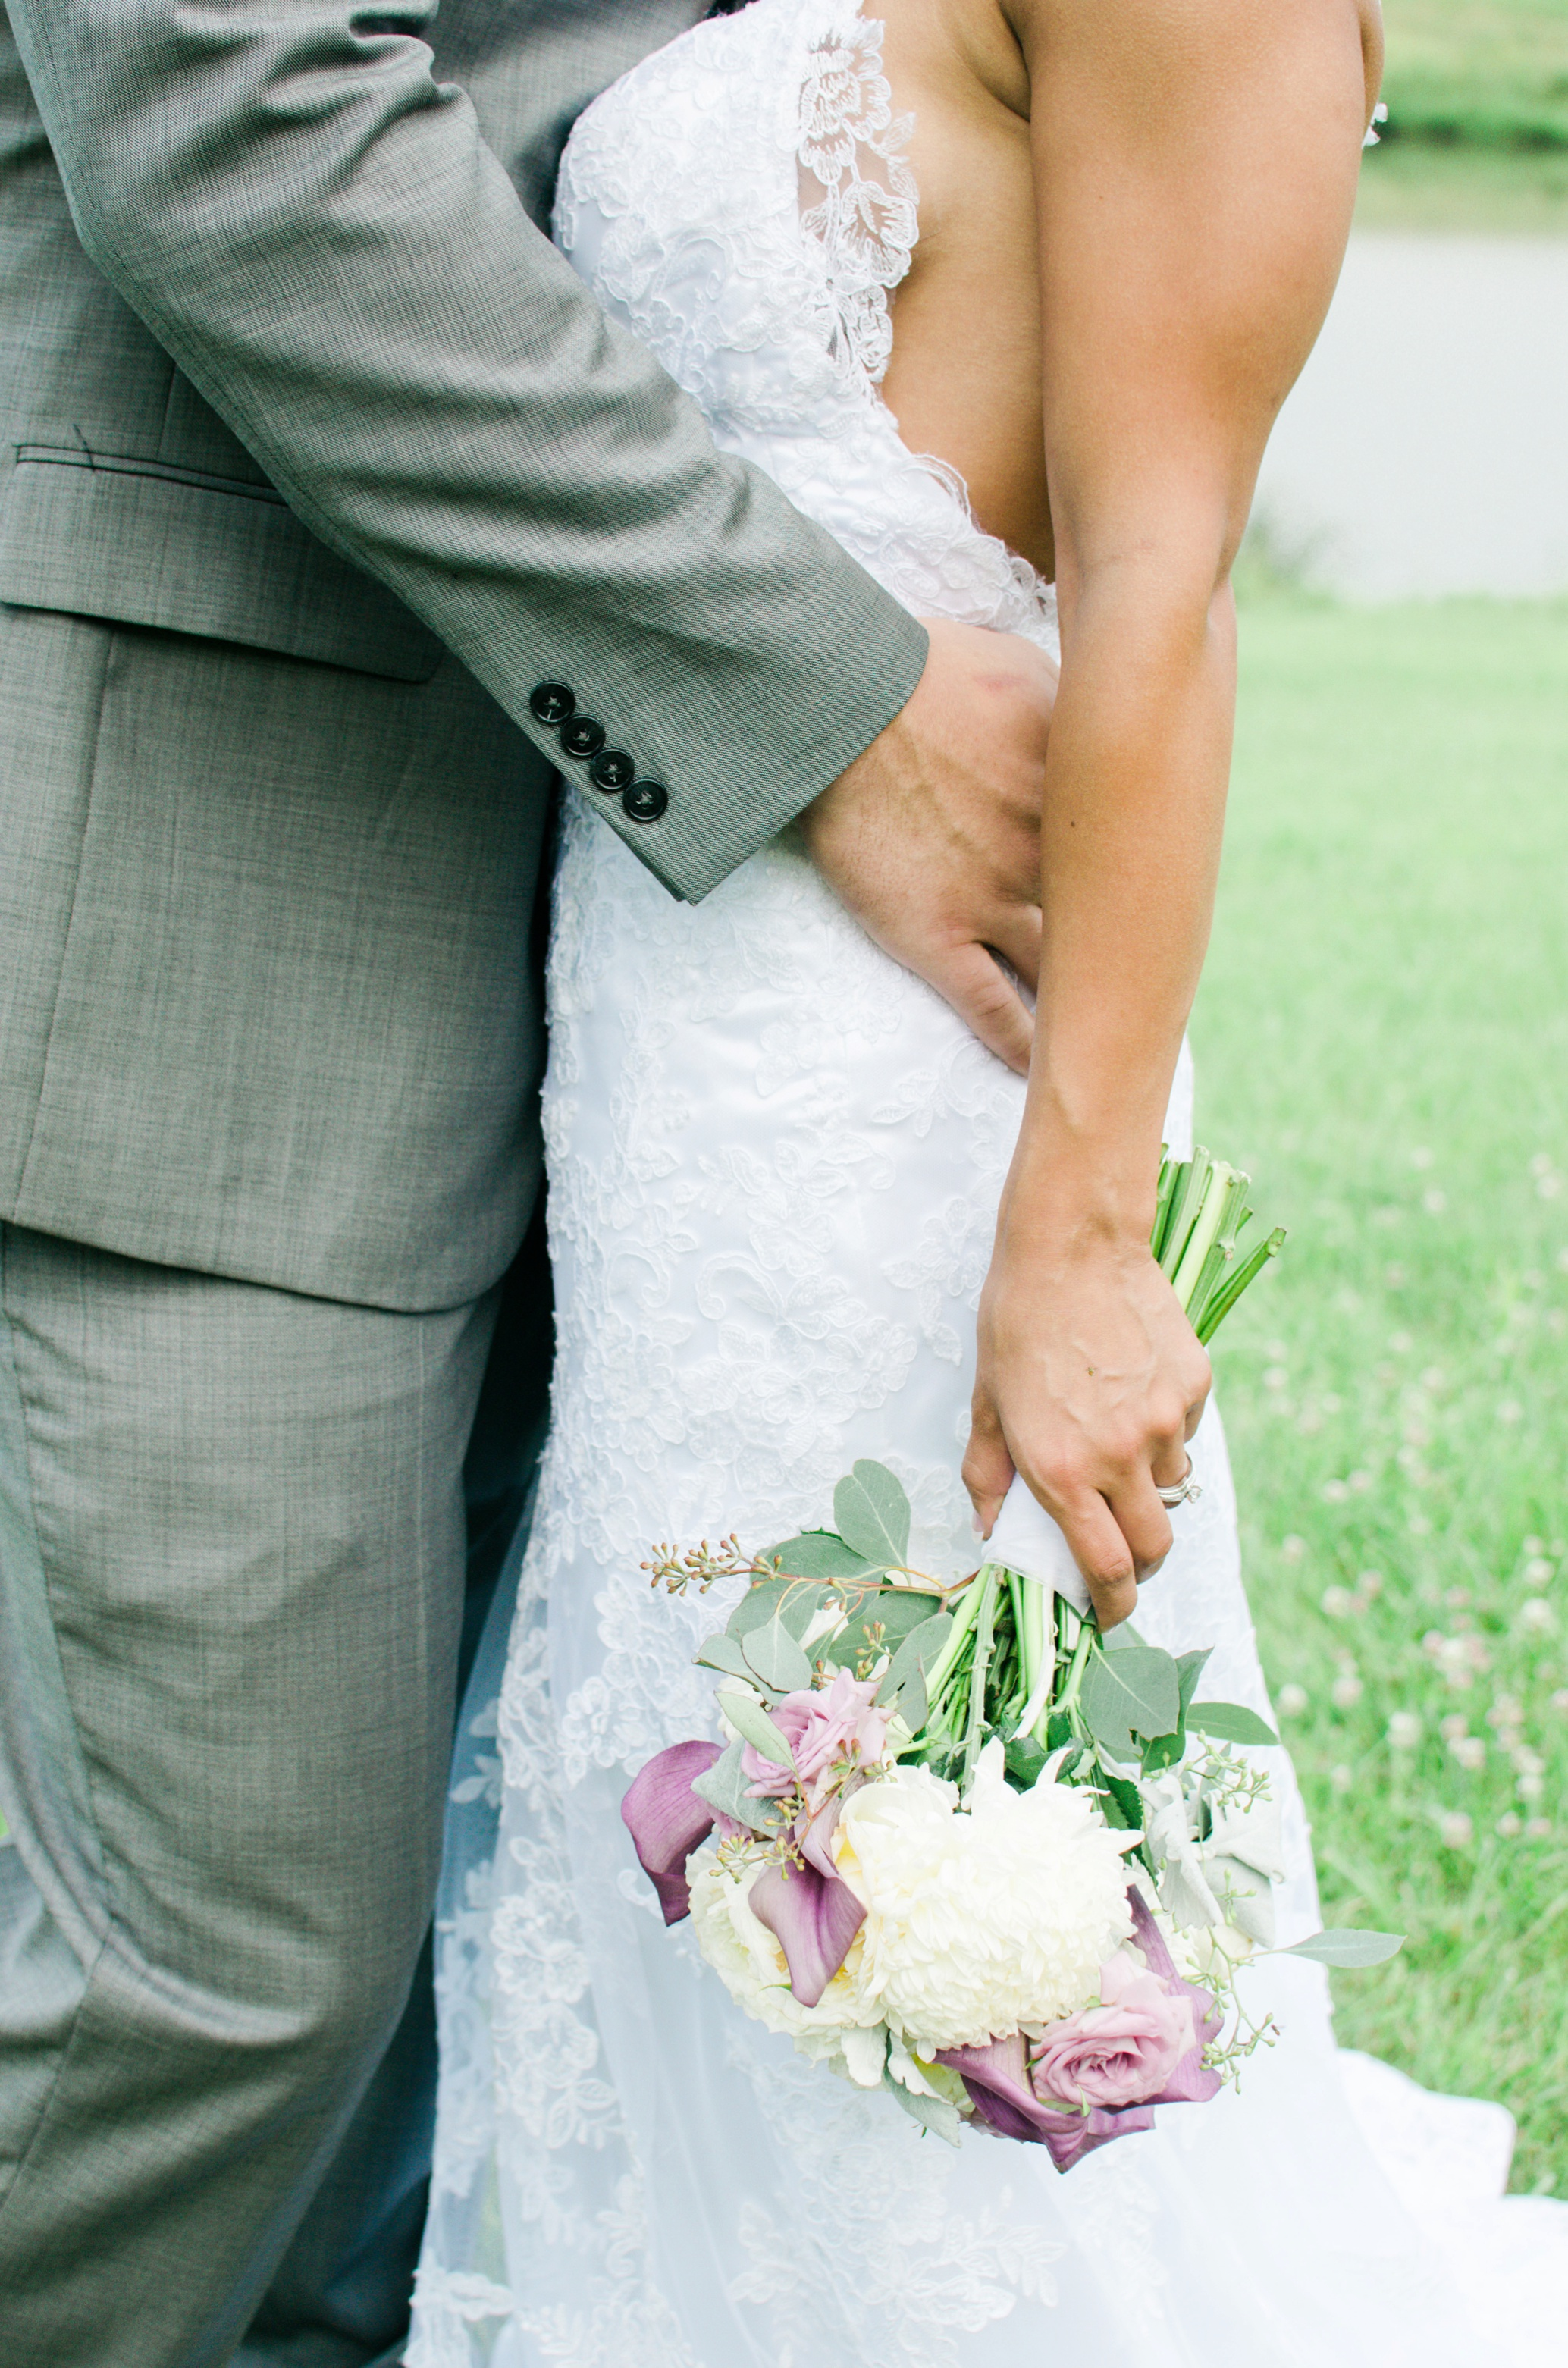 Barnes' Place Rustic Outdoor Wedding | Ali Leigh Photo Minneapolis Wedding Photographer_0201.jpg